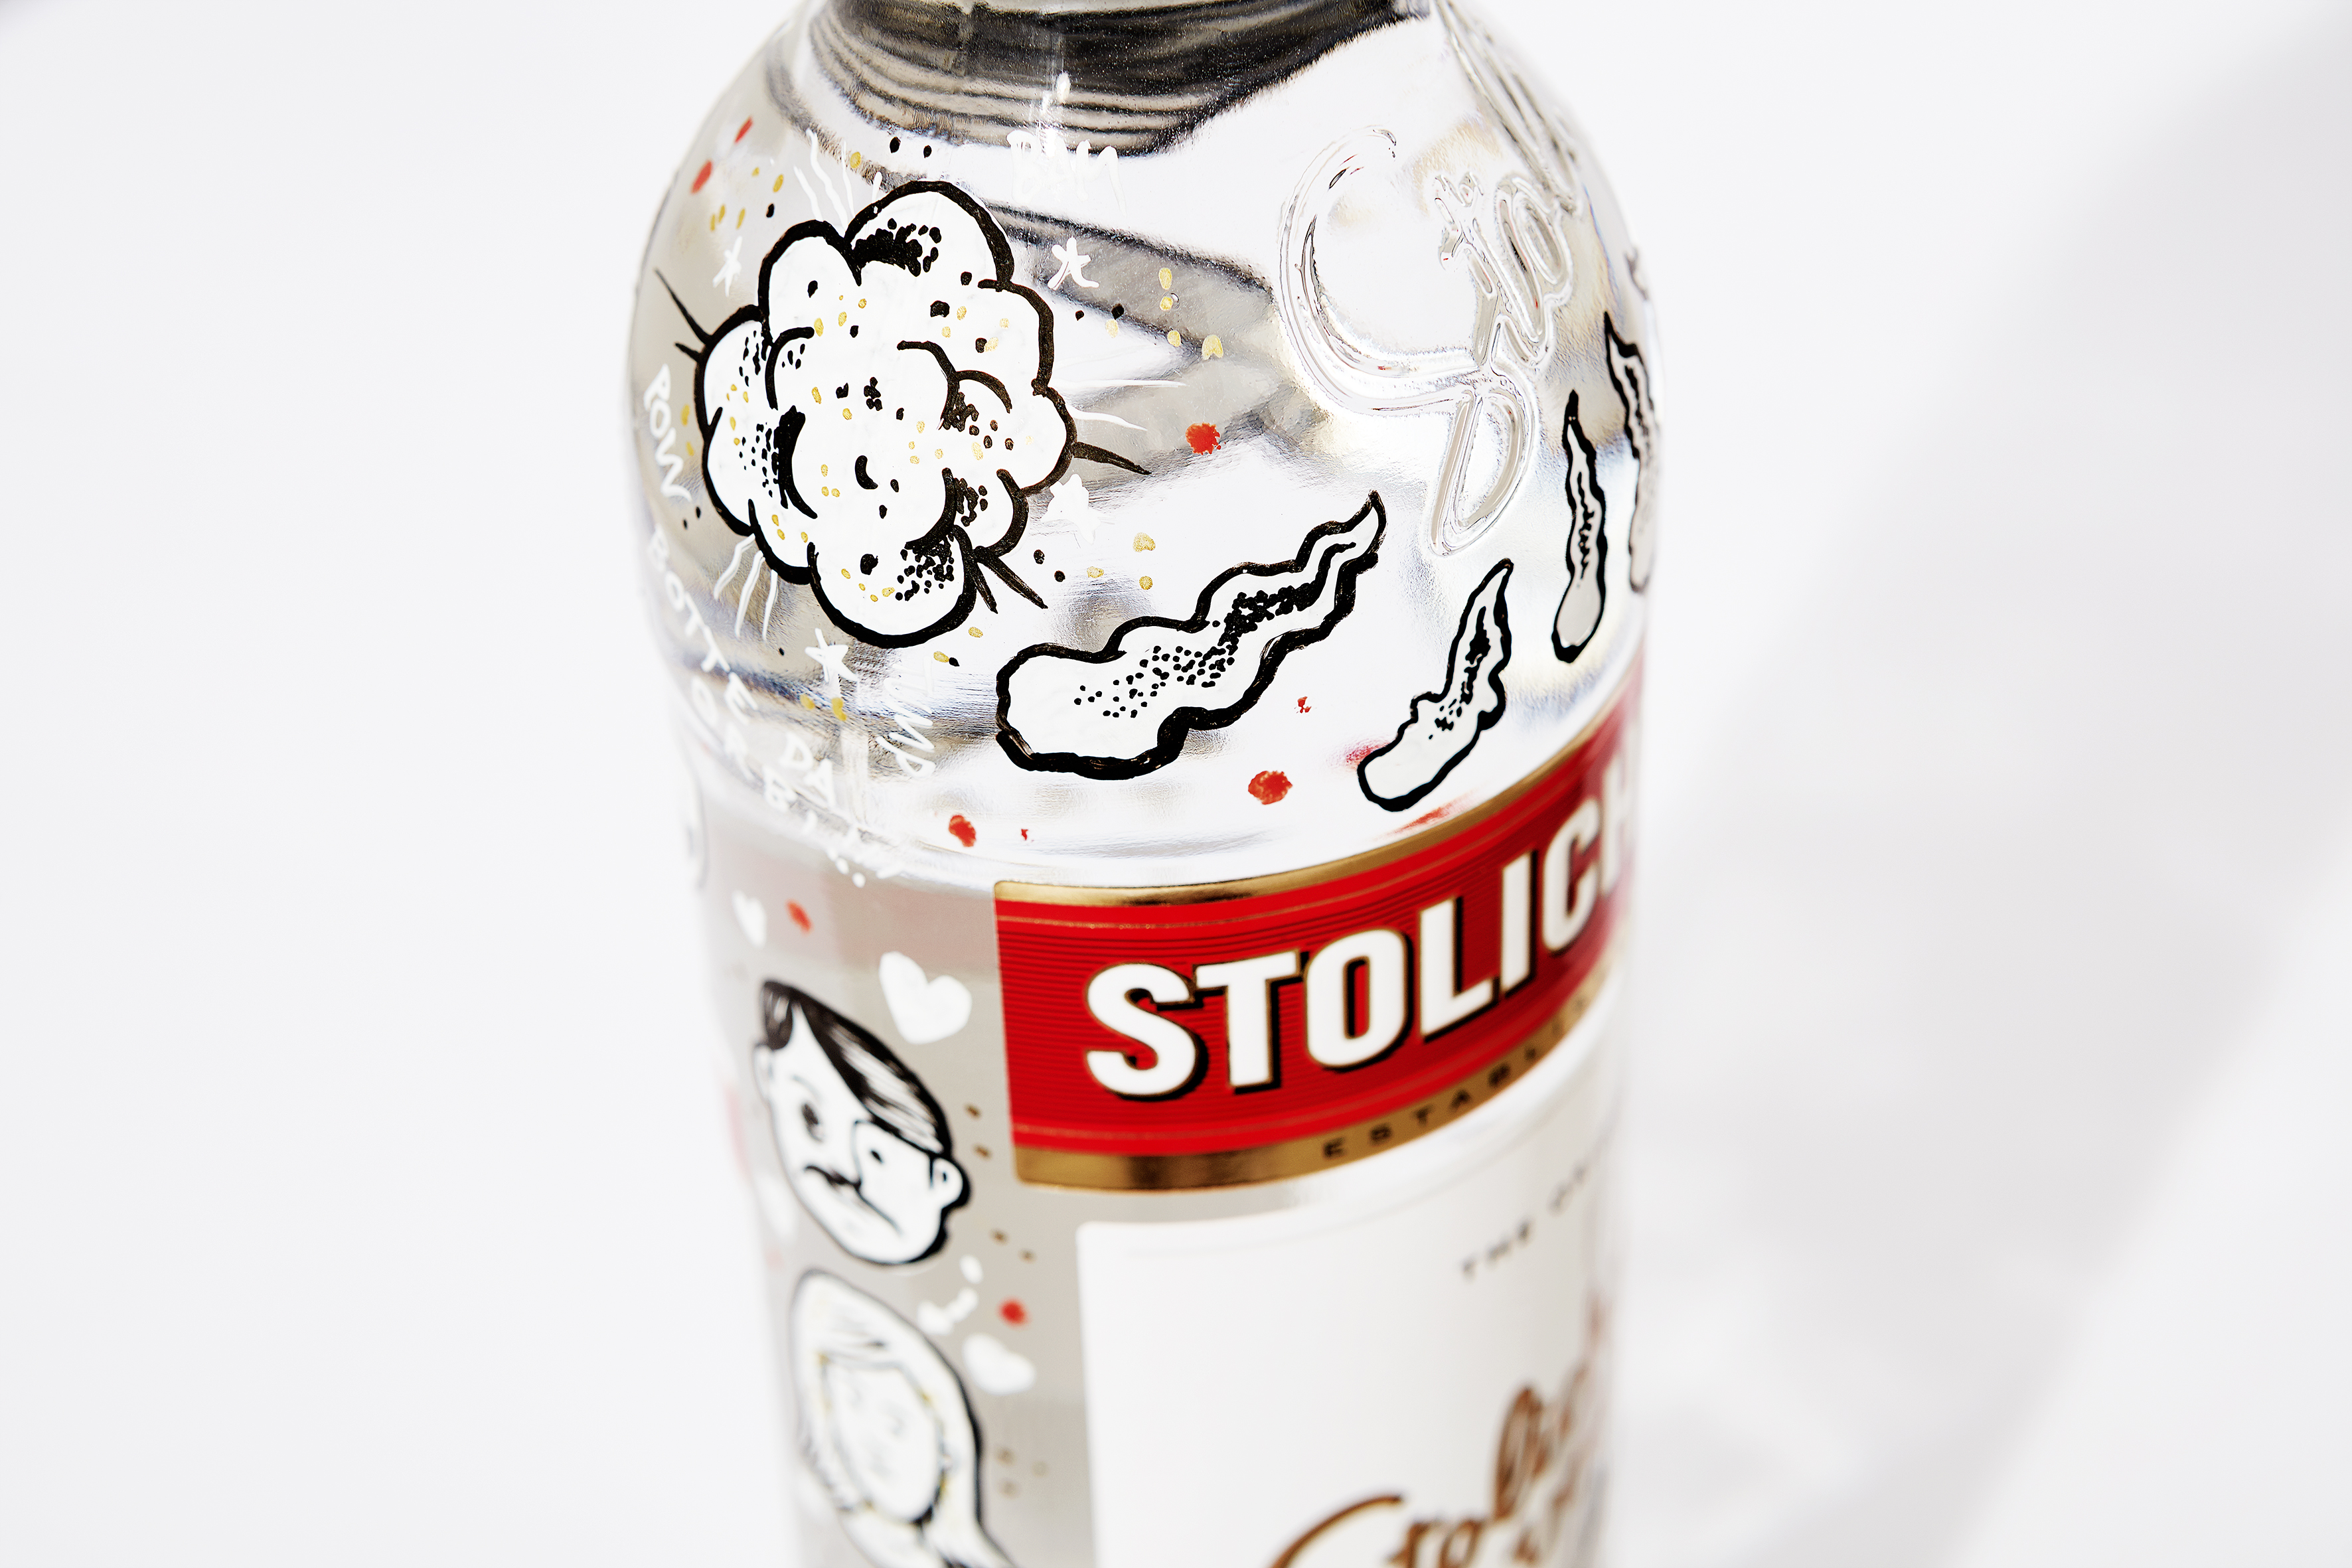 stoc01b